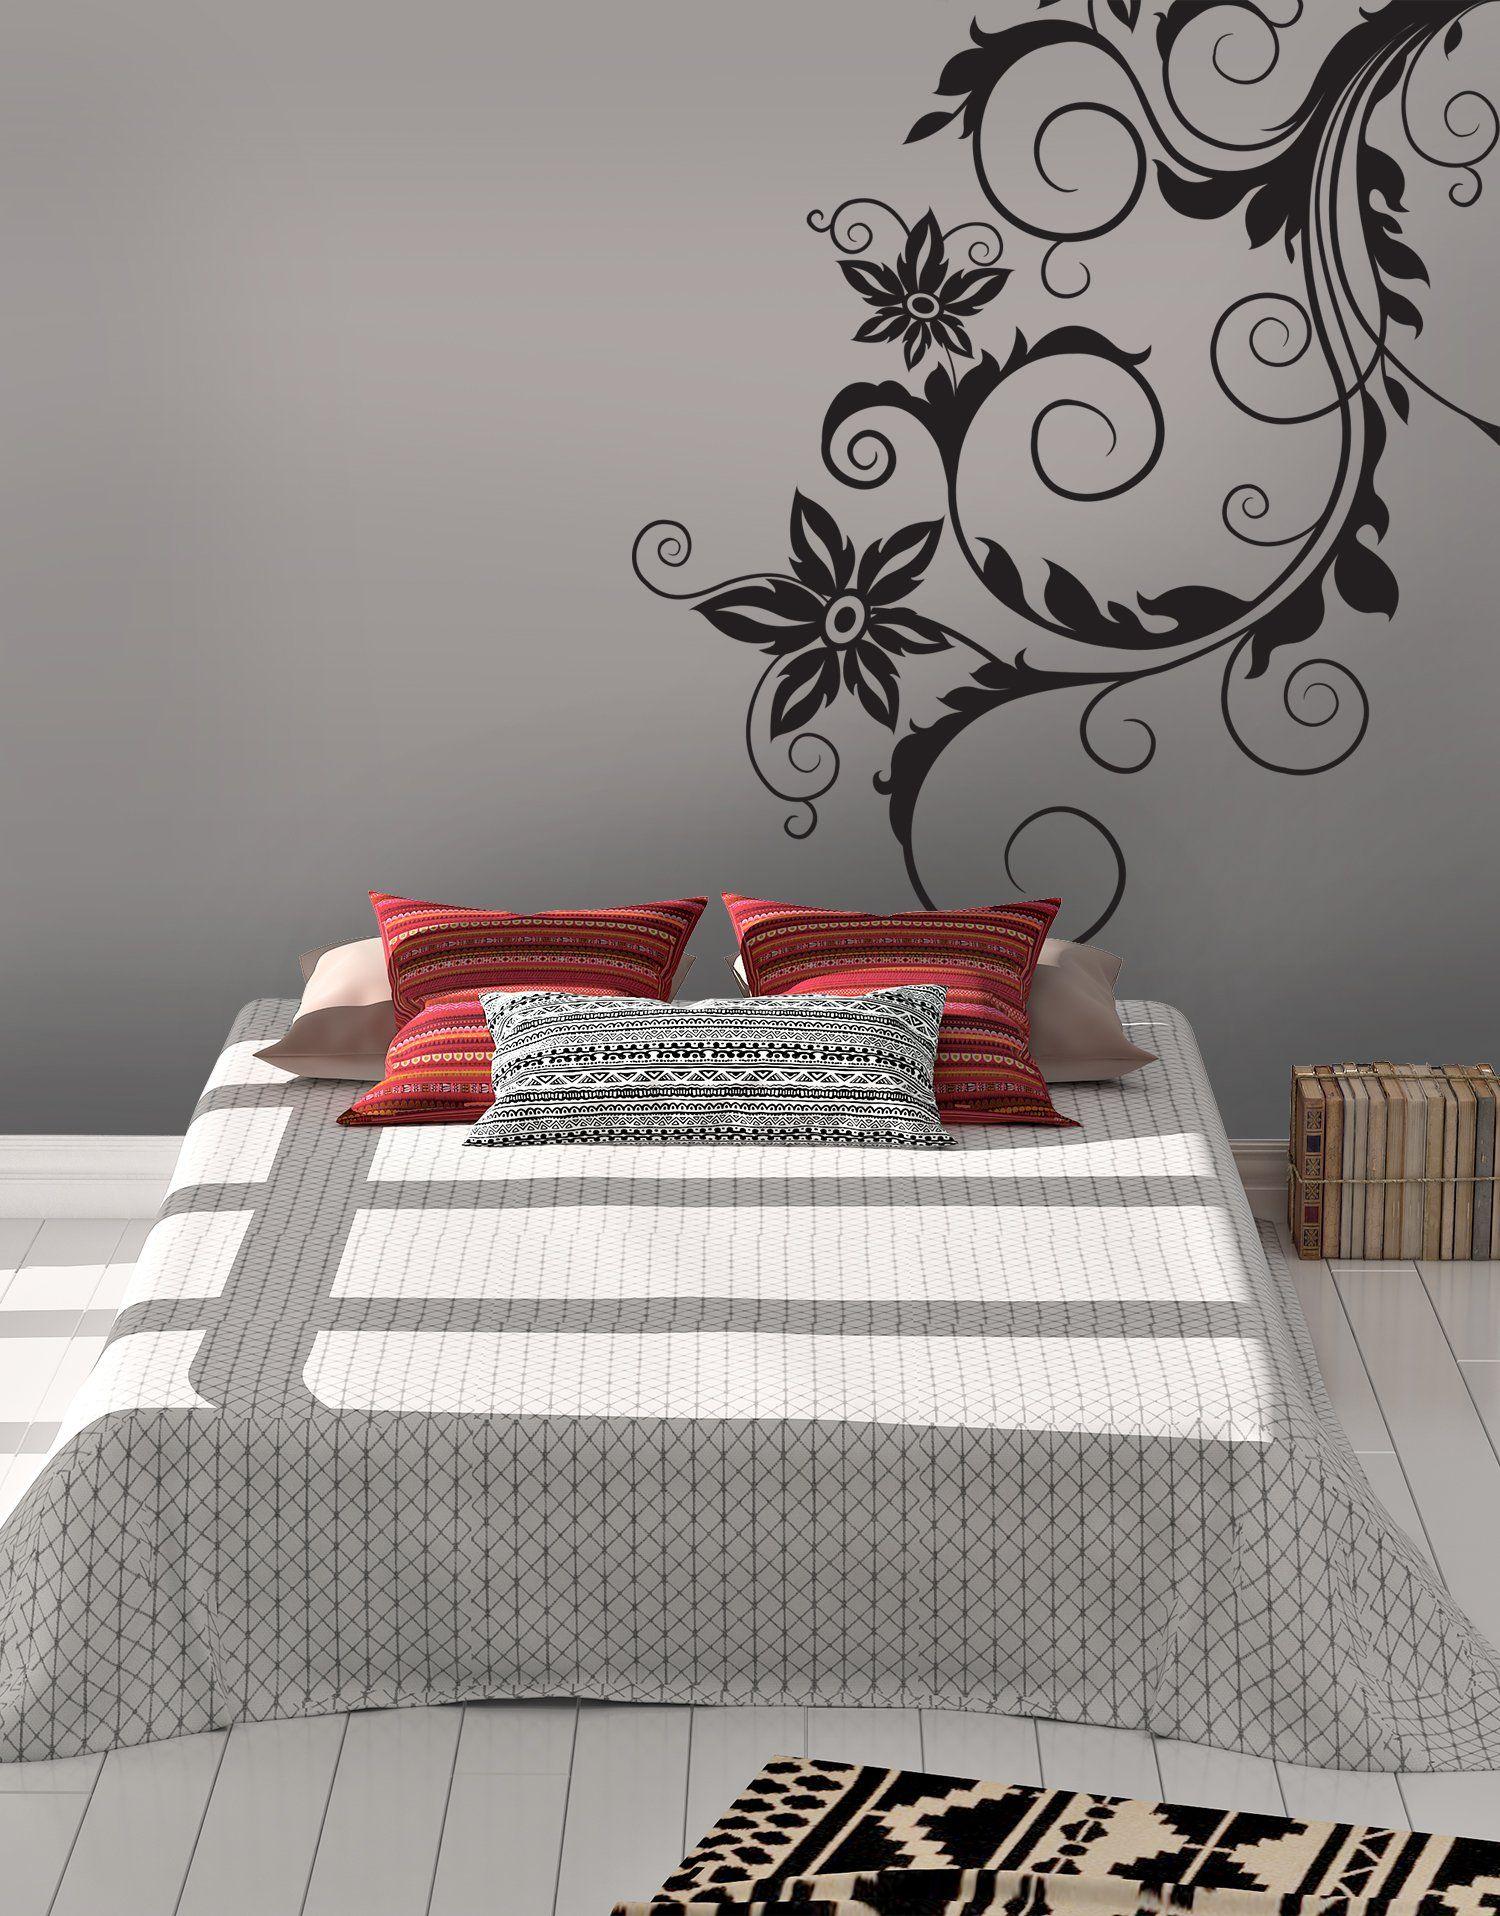 Swirl Flower Bush Wall Decal Design 419 Vinyl Wall Vinyl Wall Decals Home Wall Decor